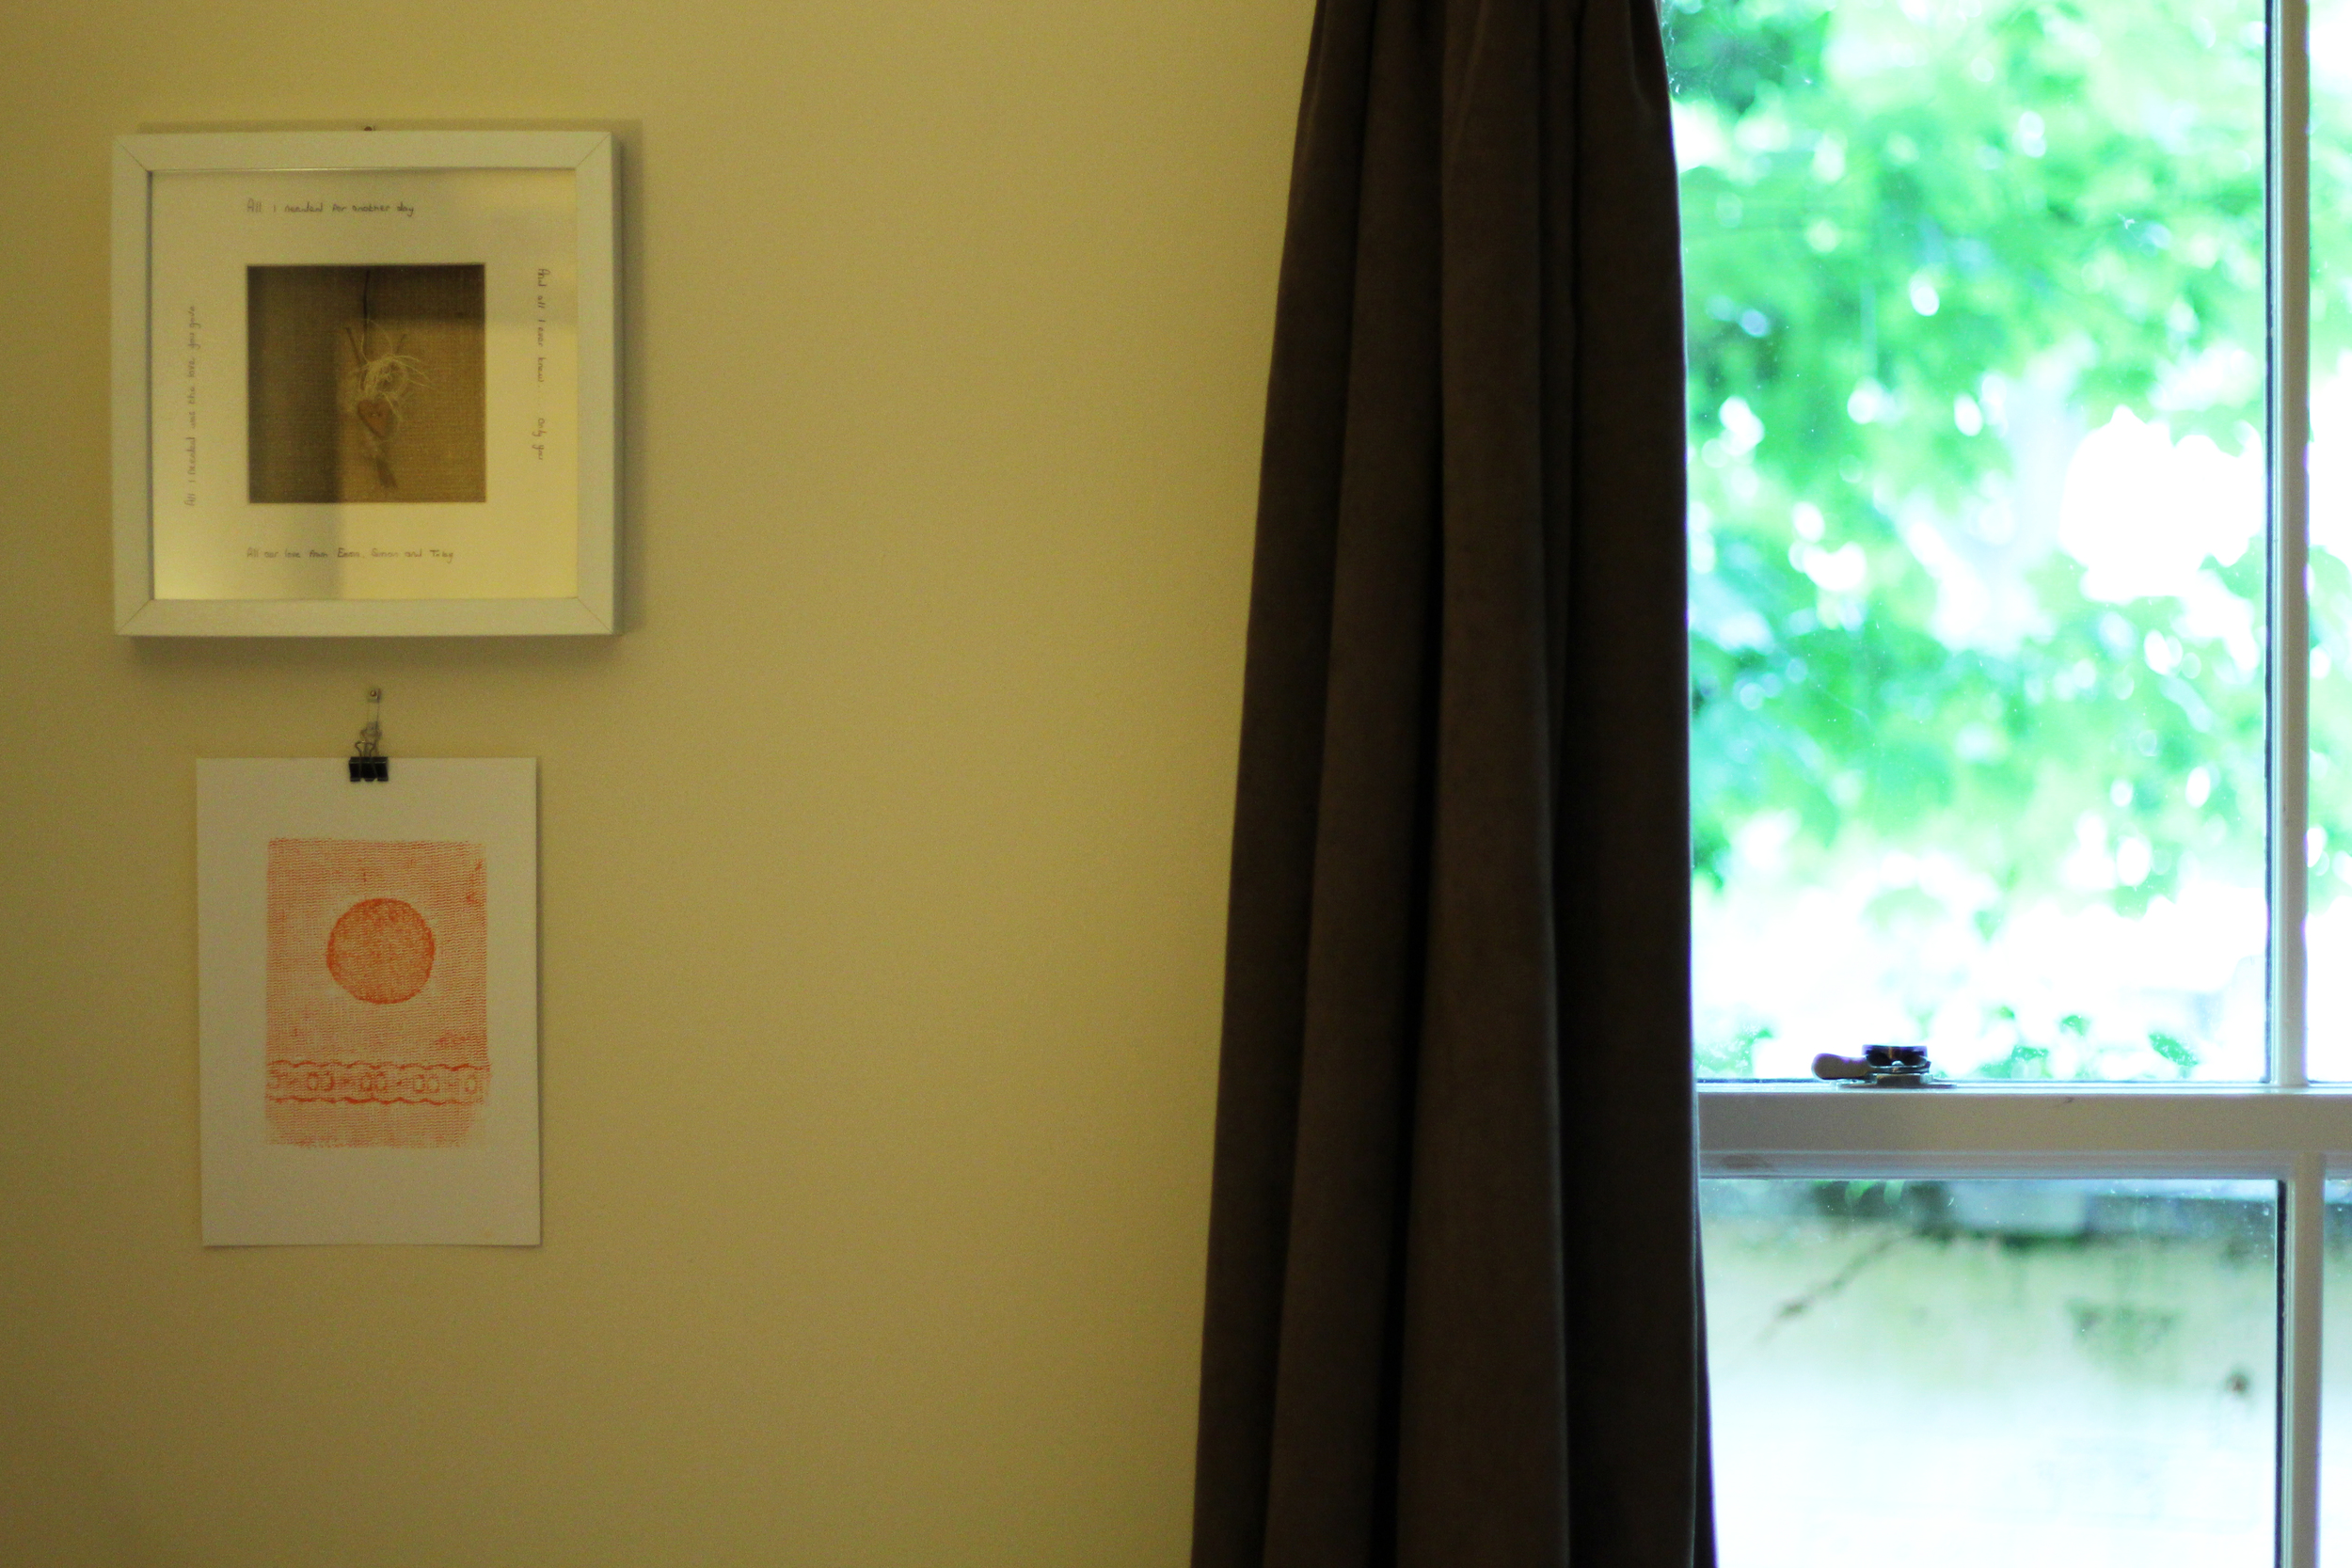 Steve's print has pride of place in our bedroom...